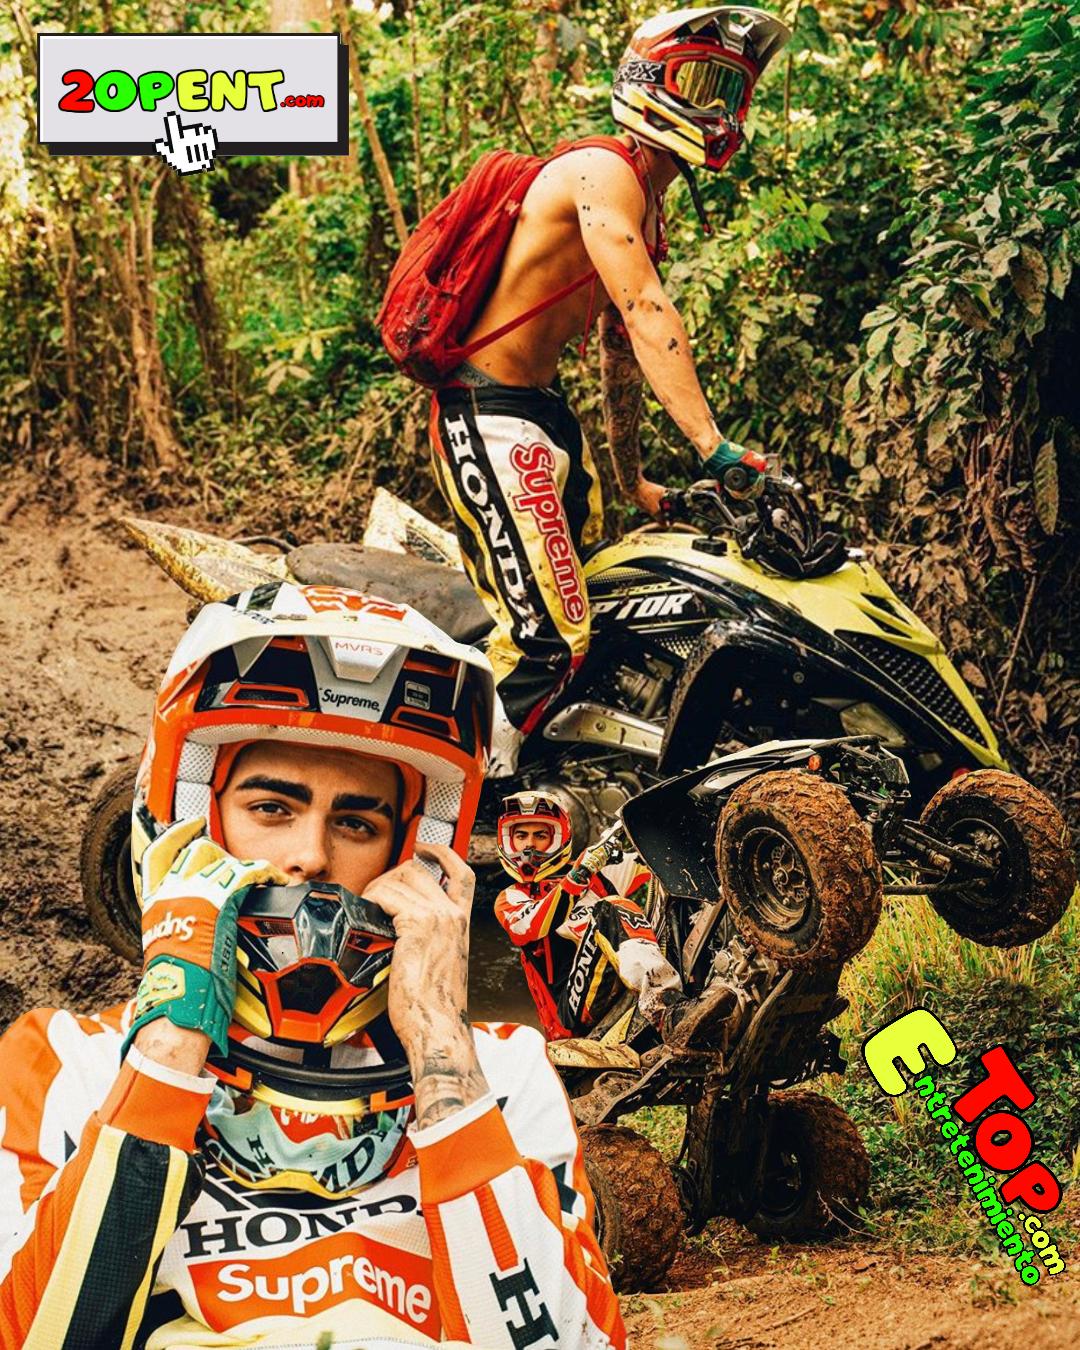 Lunay Instagram 03.17.20 Supreme Honda